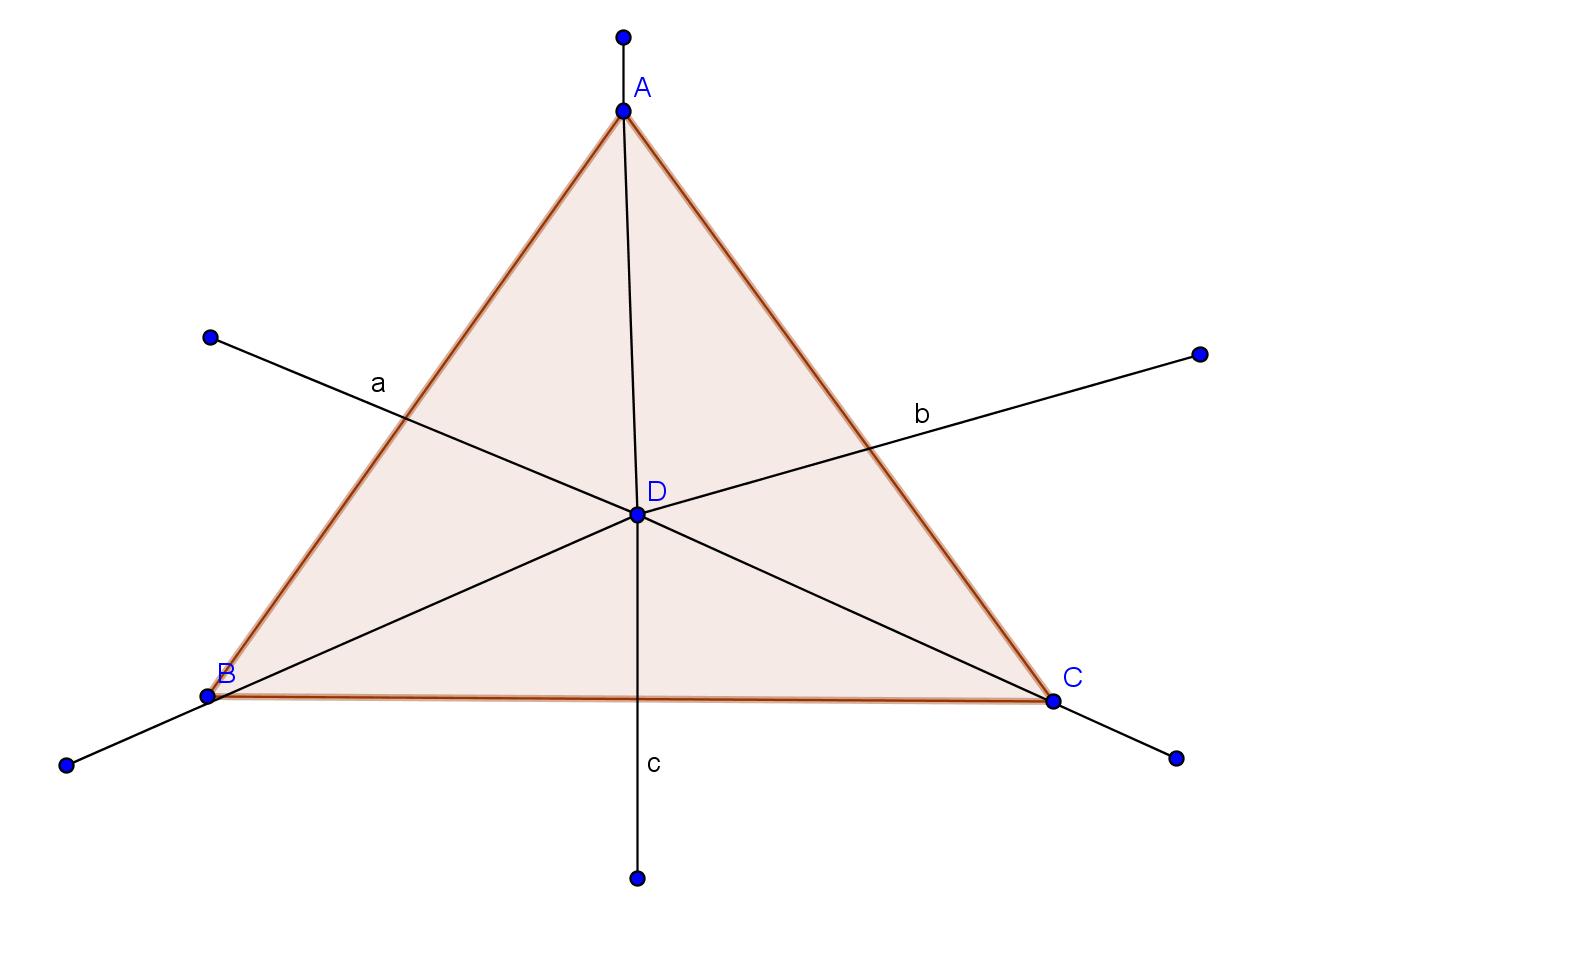 Congruent Triangles In Bridges Of congruent triangles are